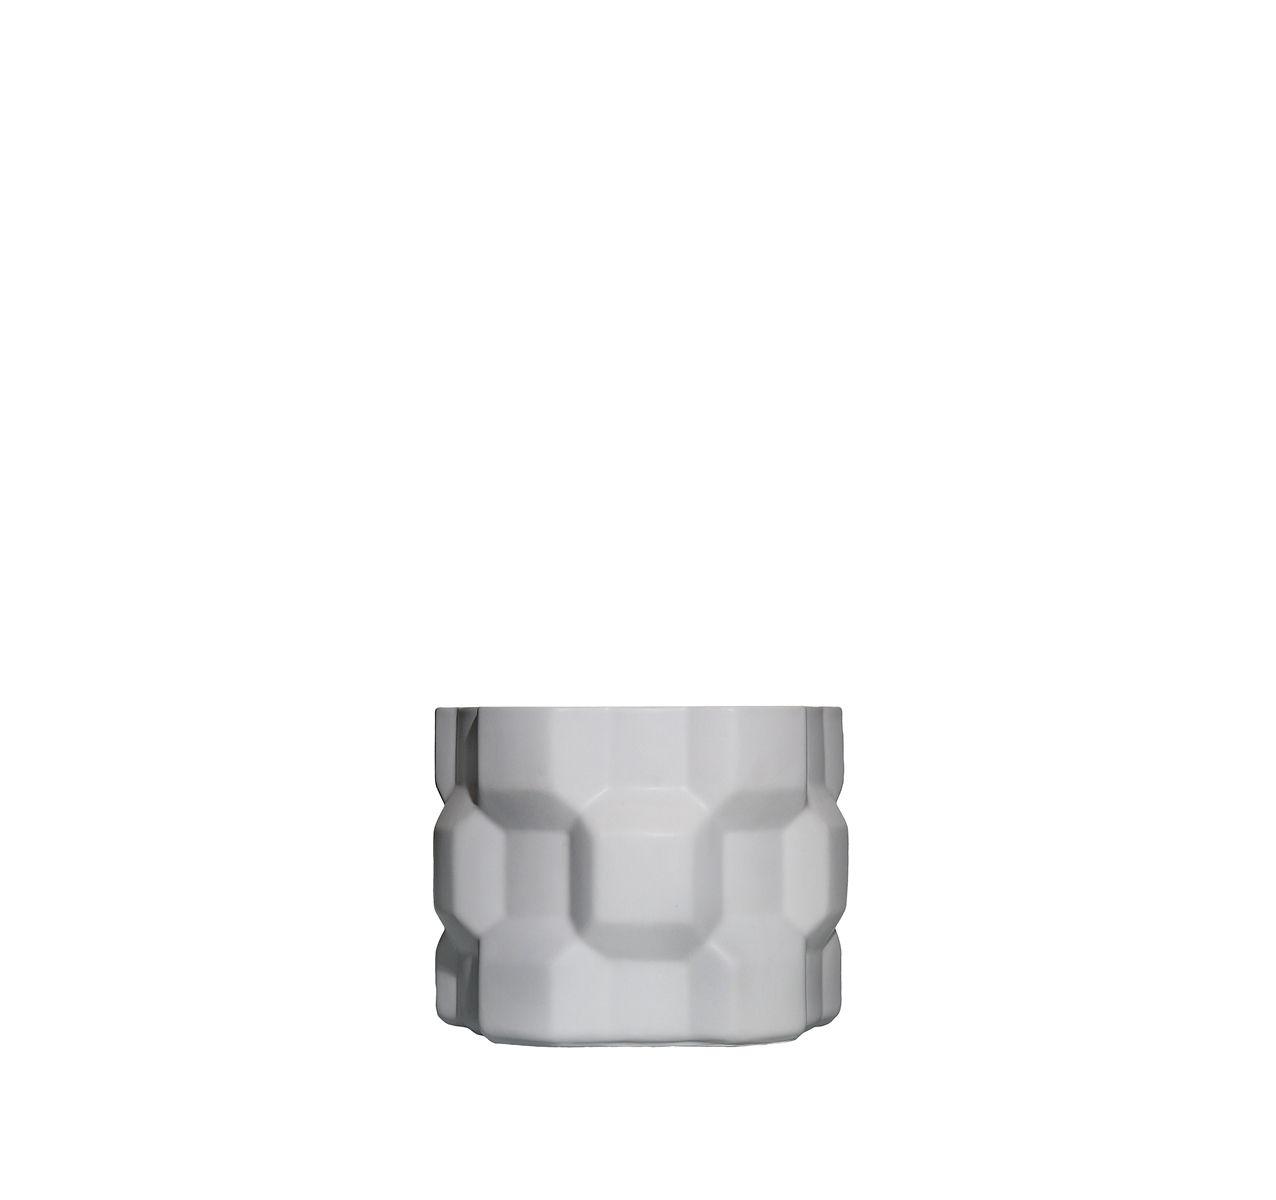 Gear Vase Matt White, Glossy White